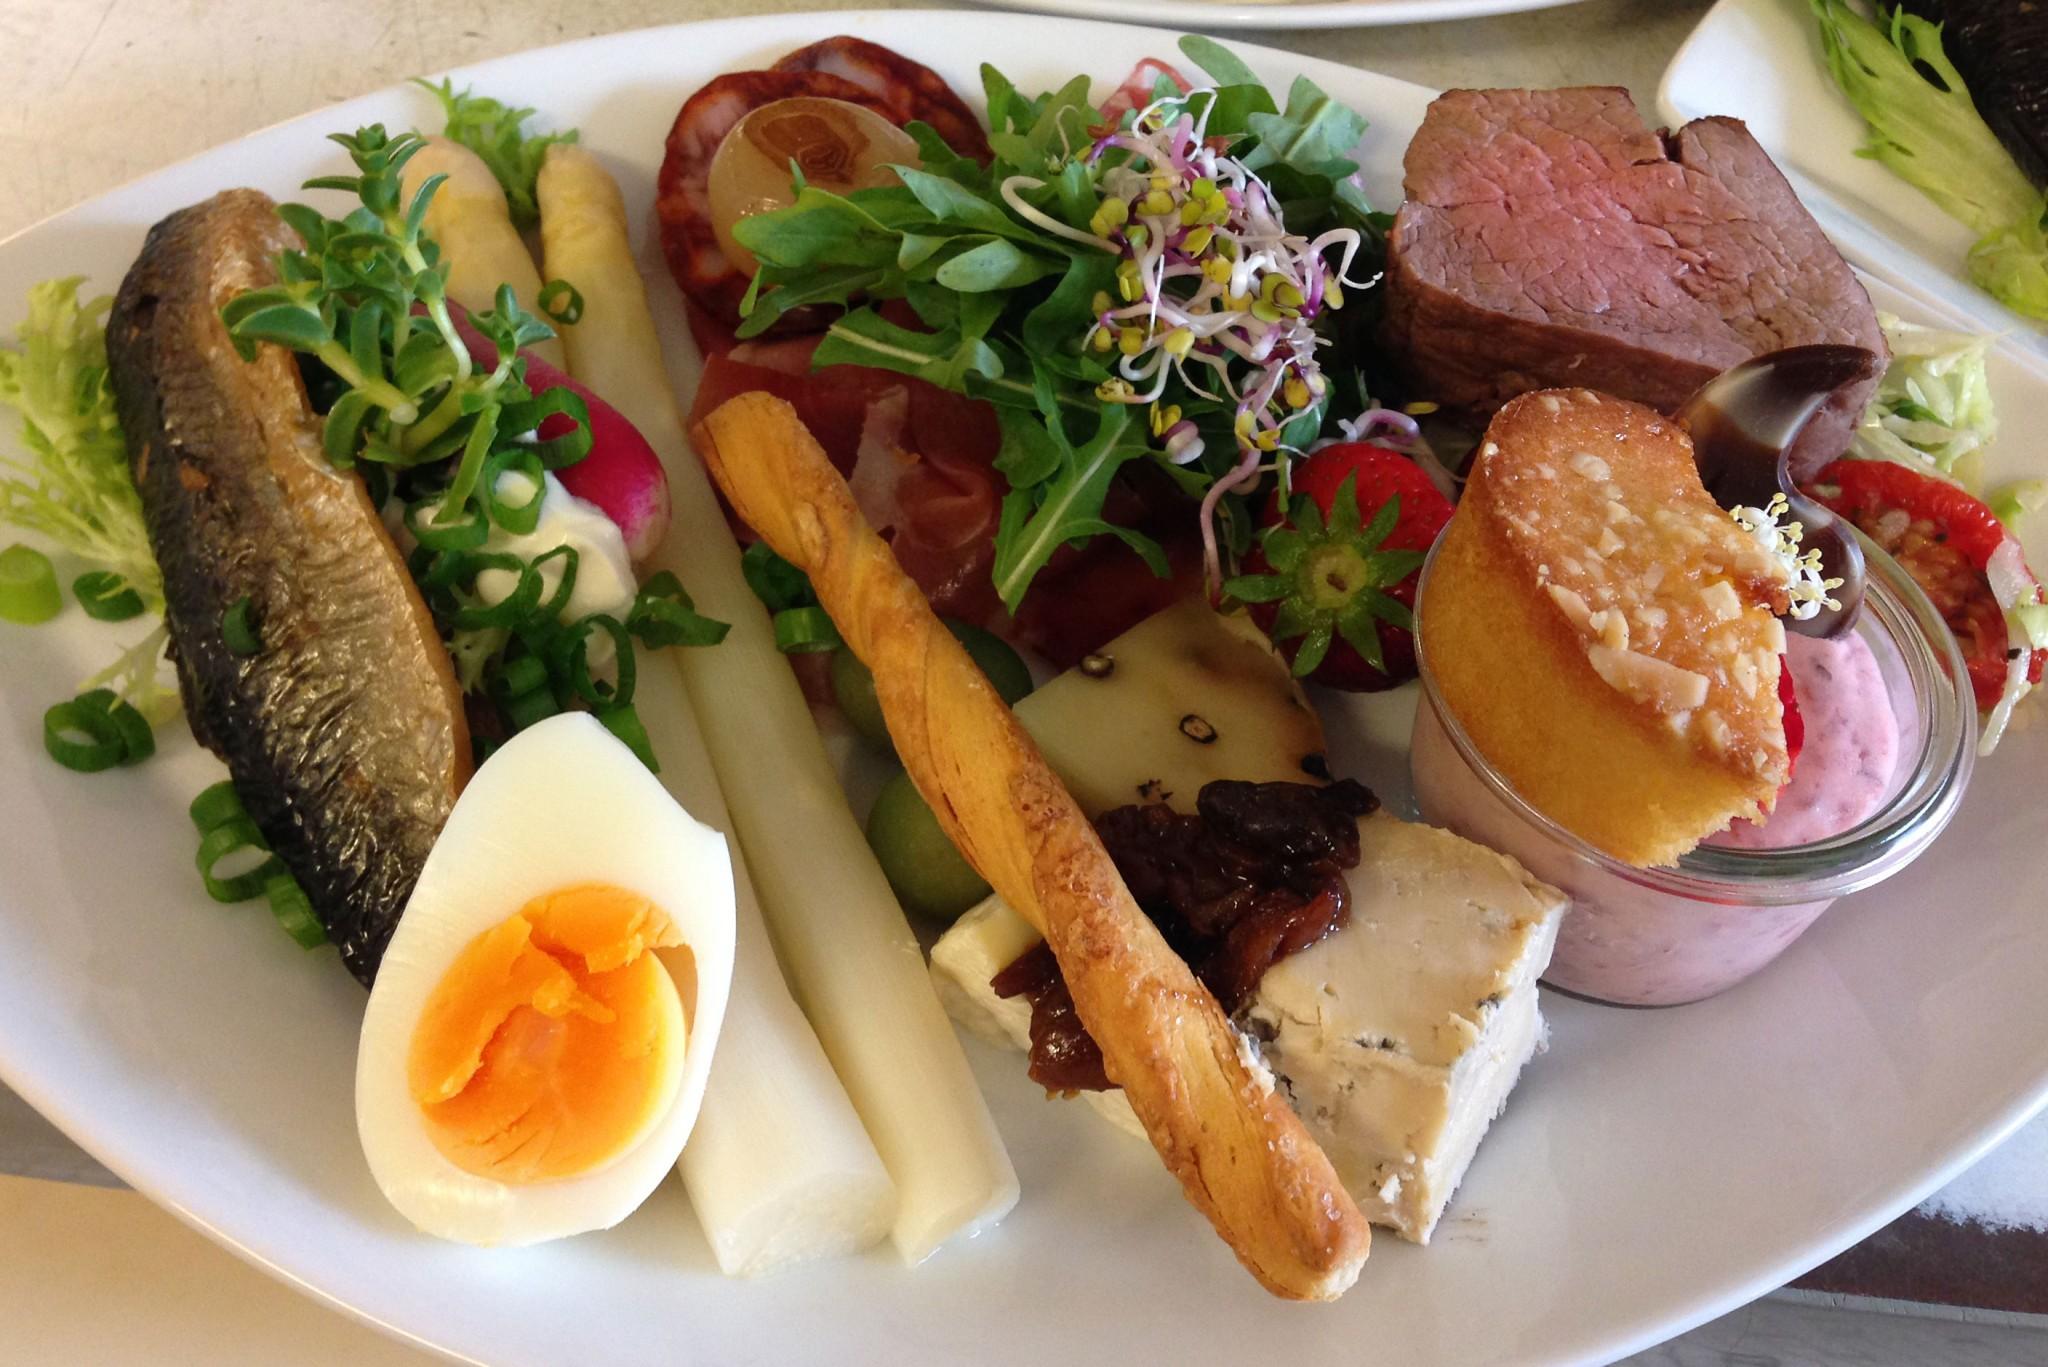 Frokost, Smørrebrød, Sandwich og Tapas